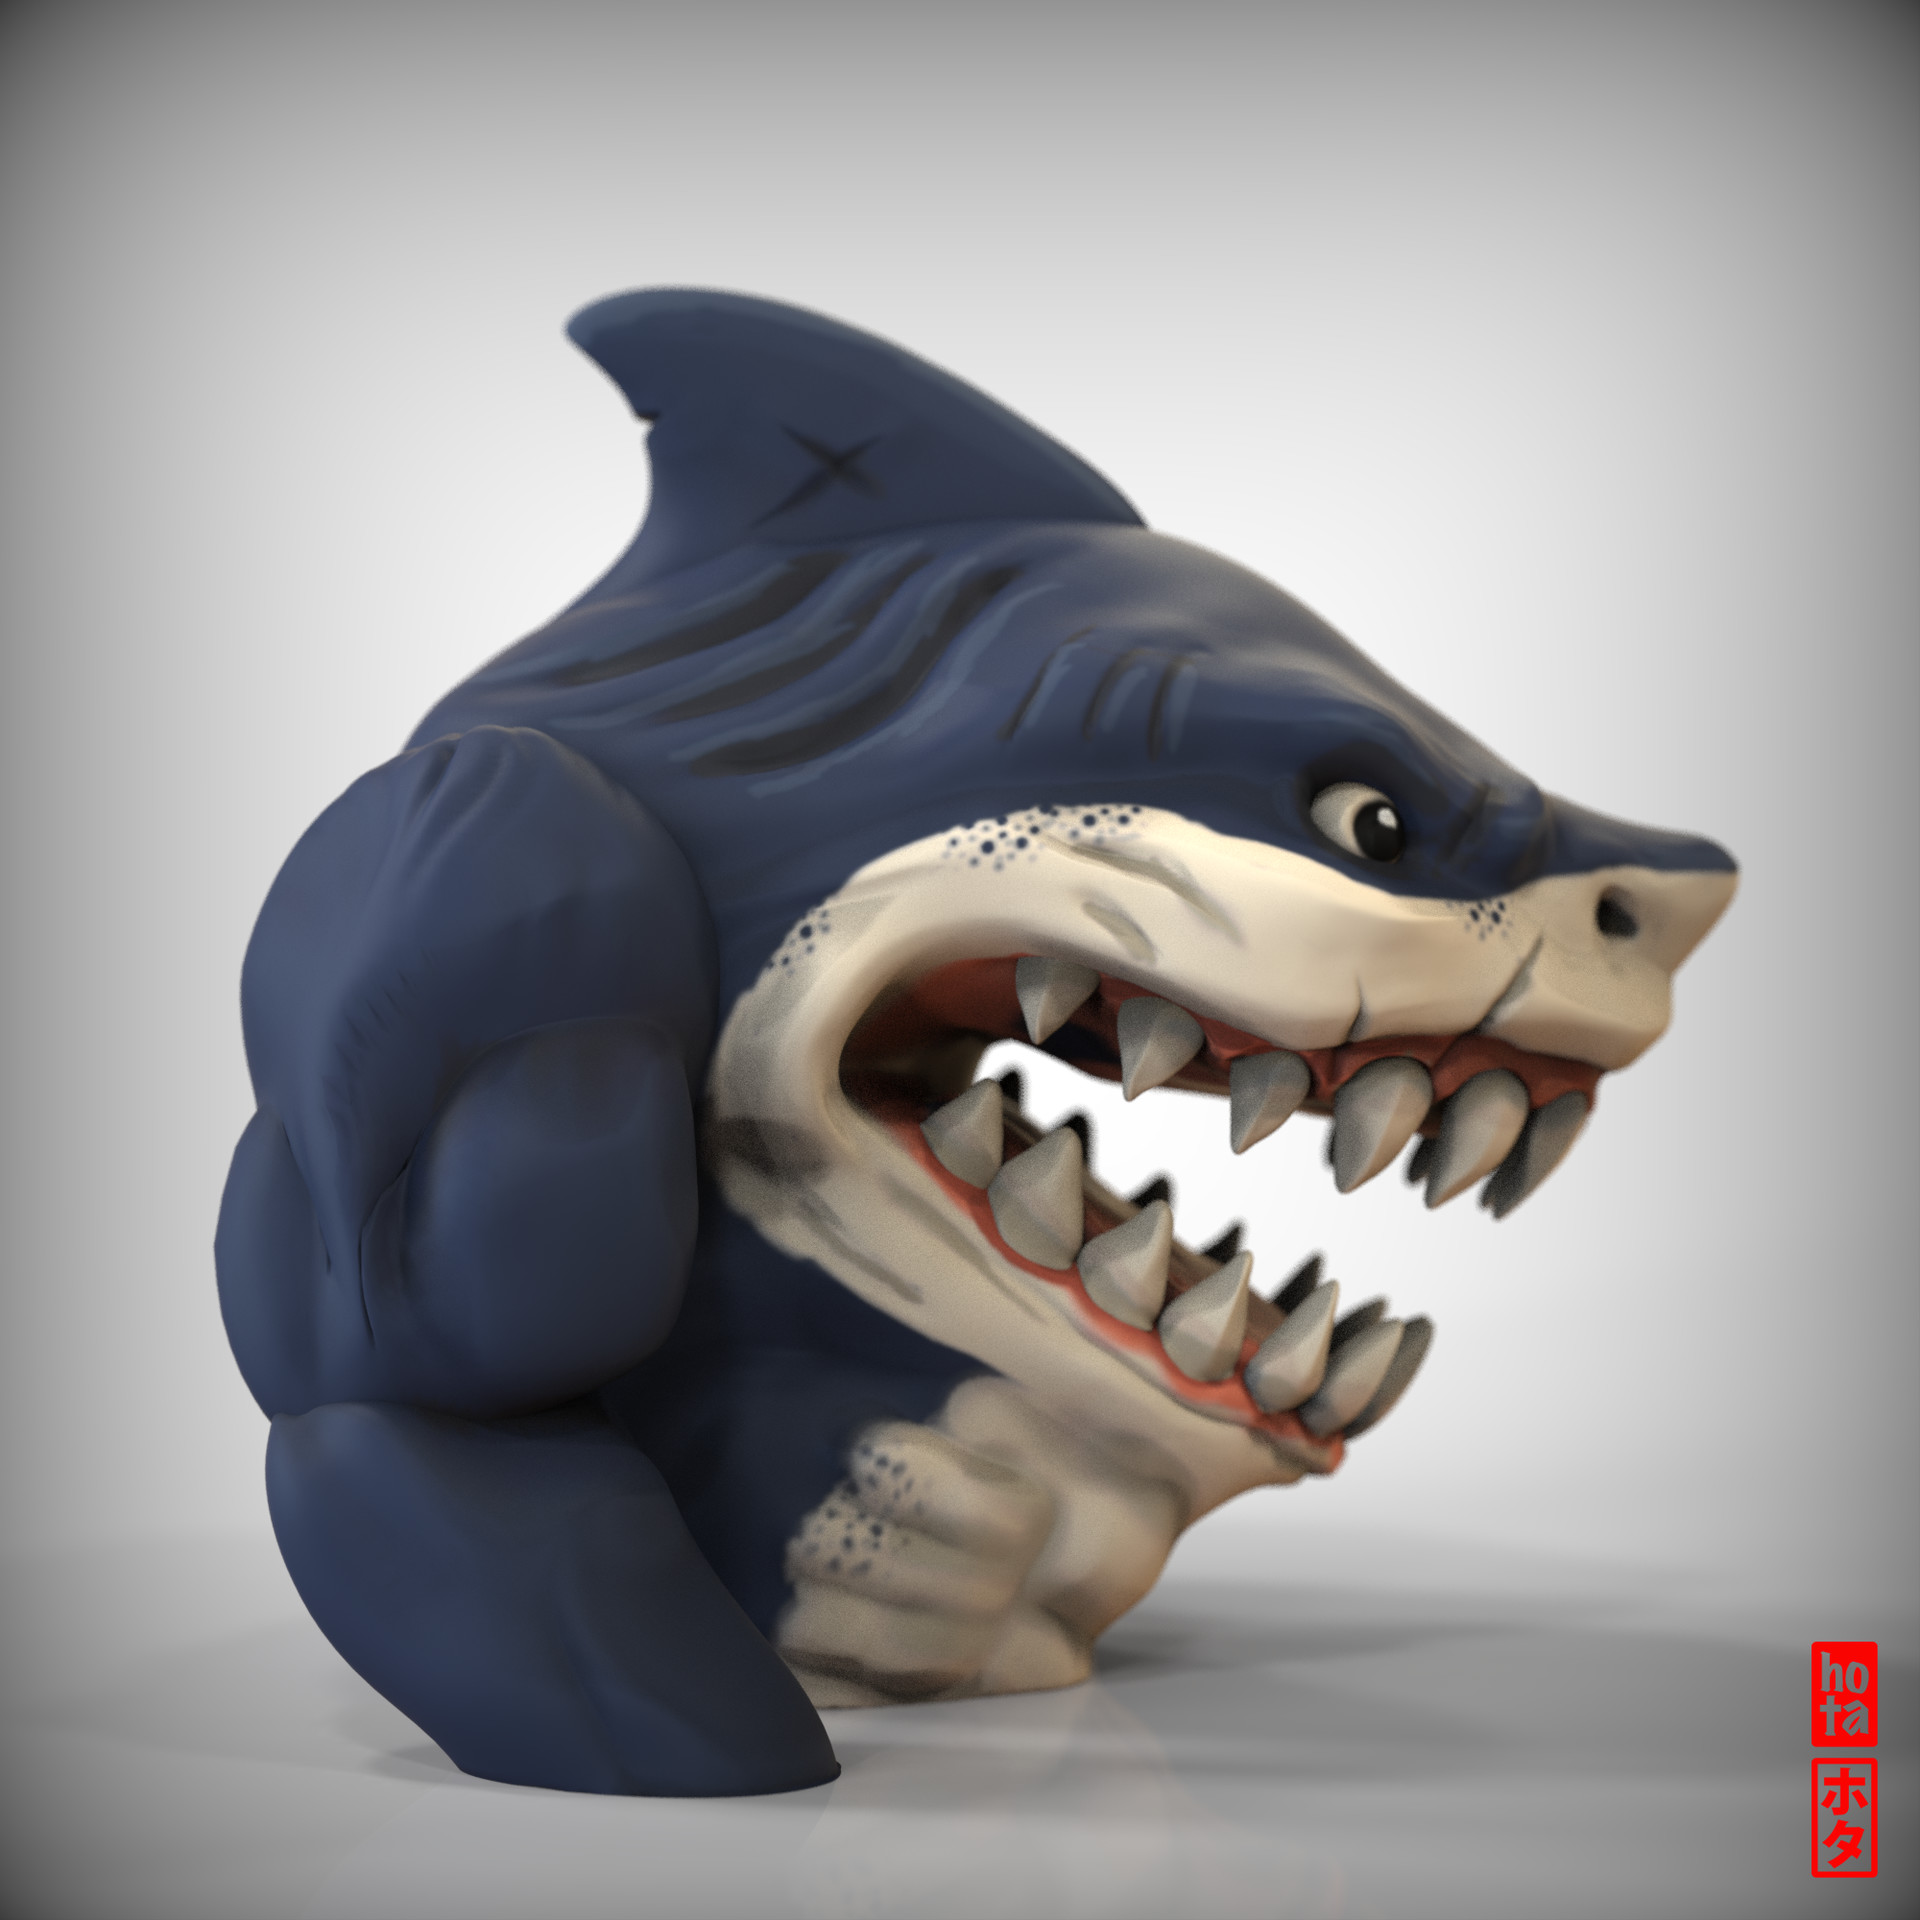 Hota aisa street sharks5